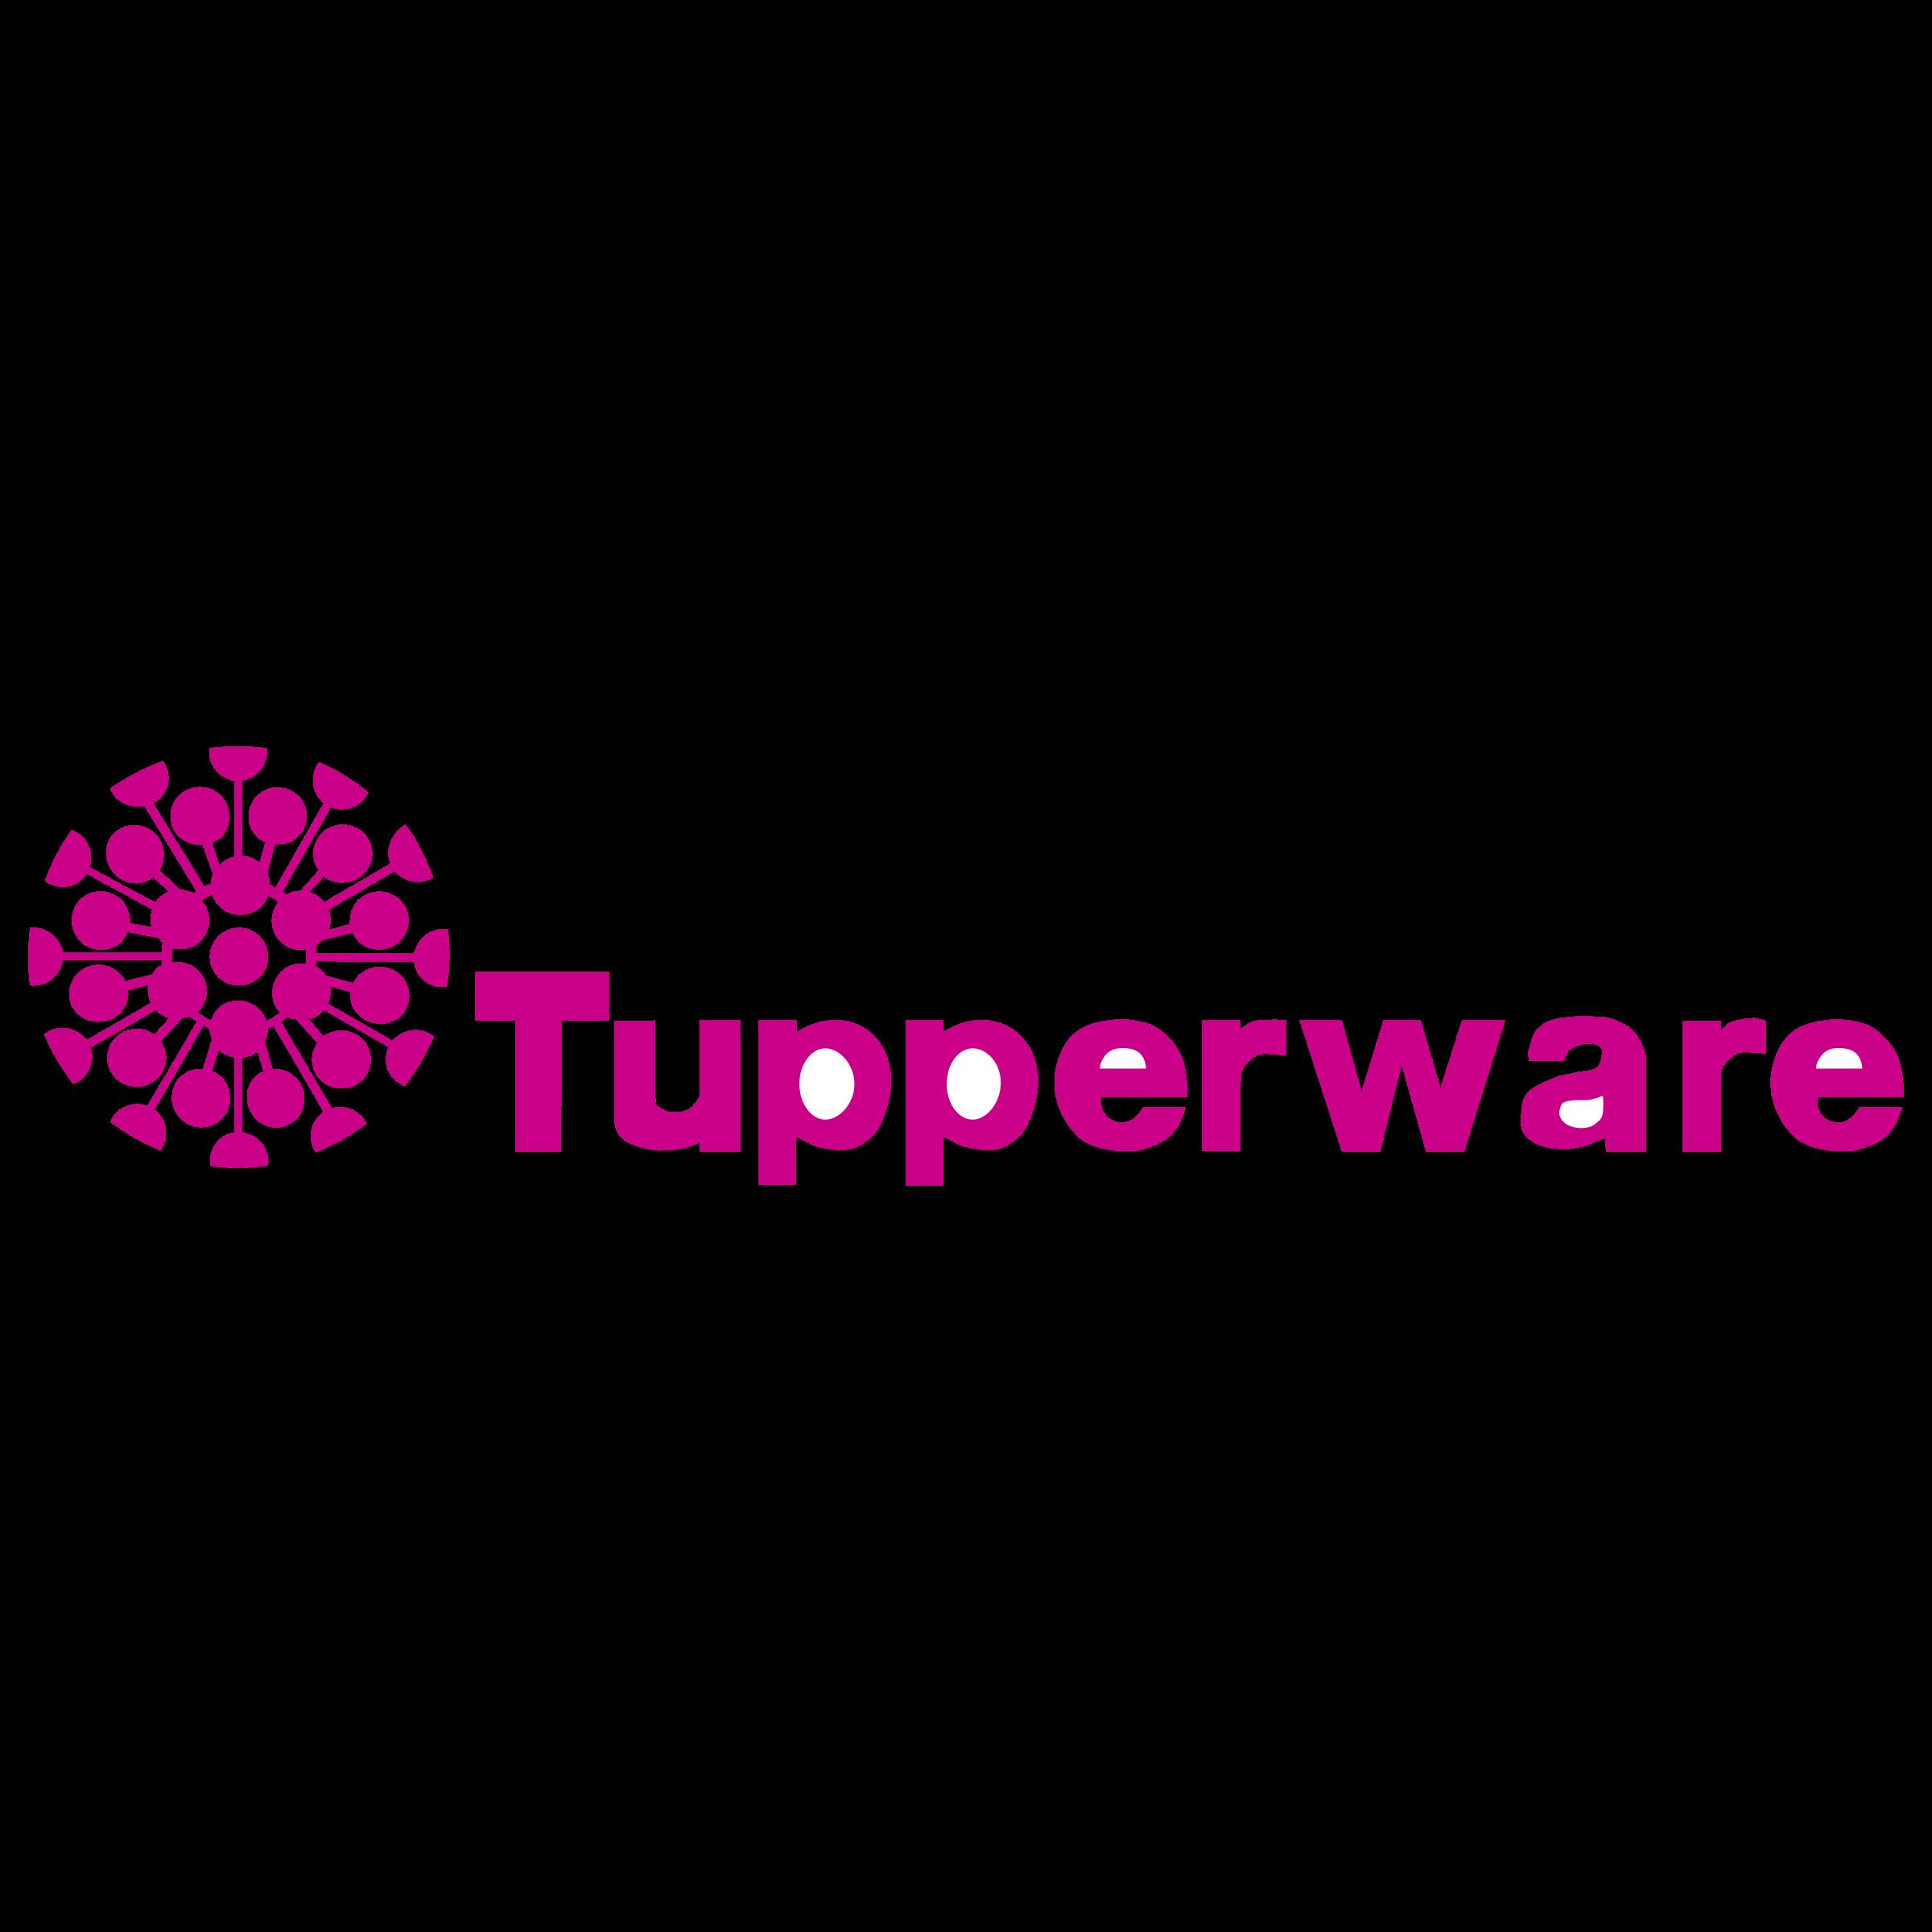 Tupperware Logo PNG Transparent & SVG Vector.